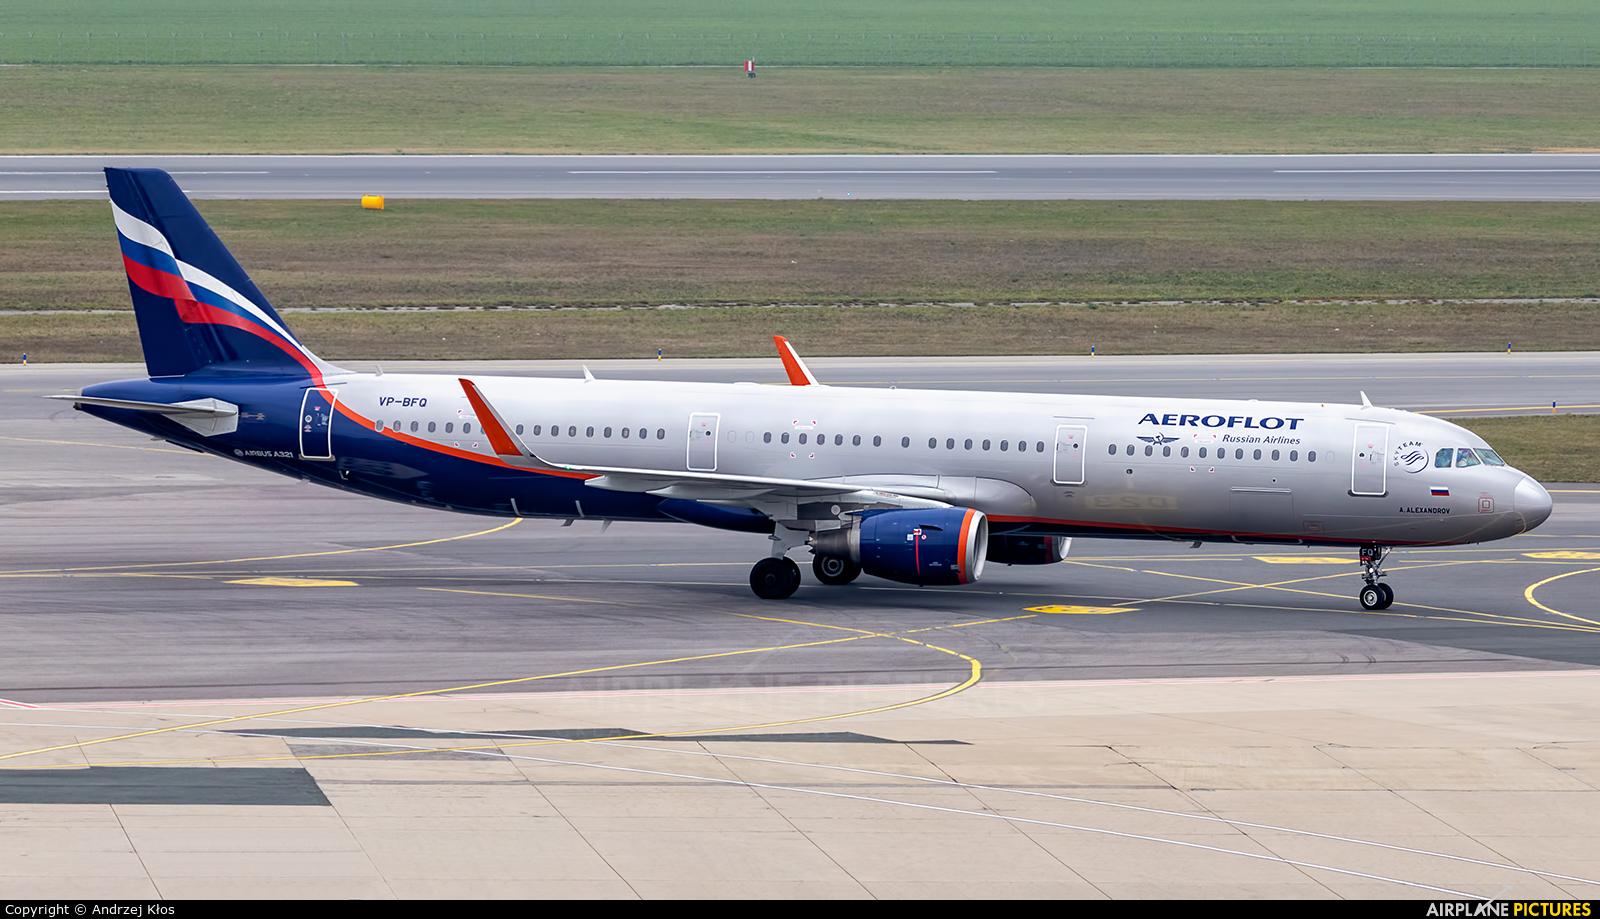 Aeroflot VP-BFQ aircraft at Vienna - Schwechat